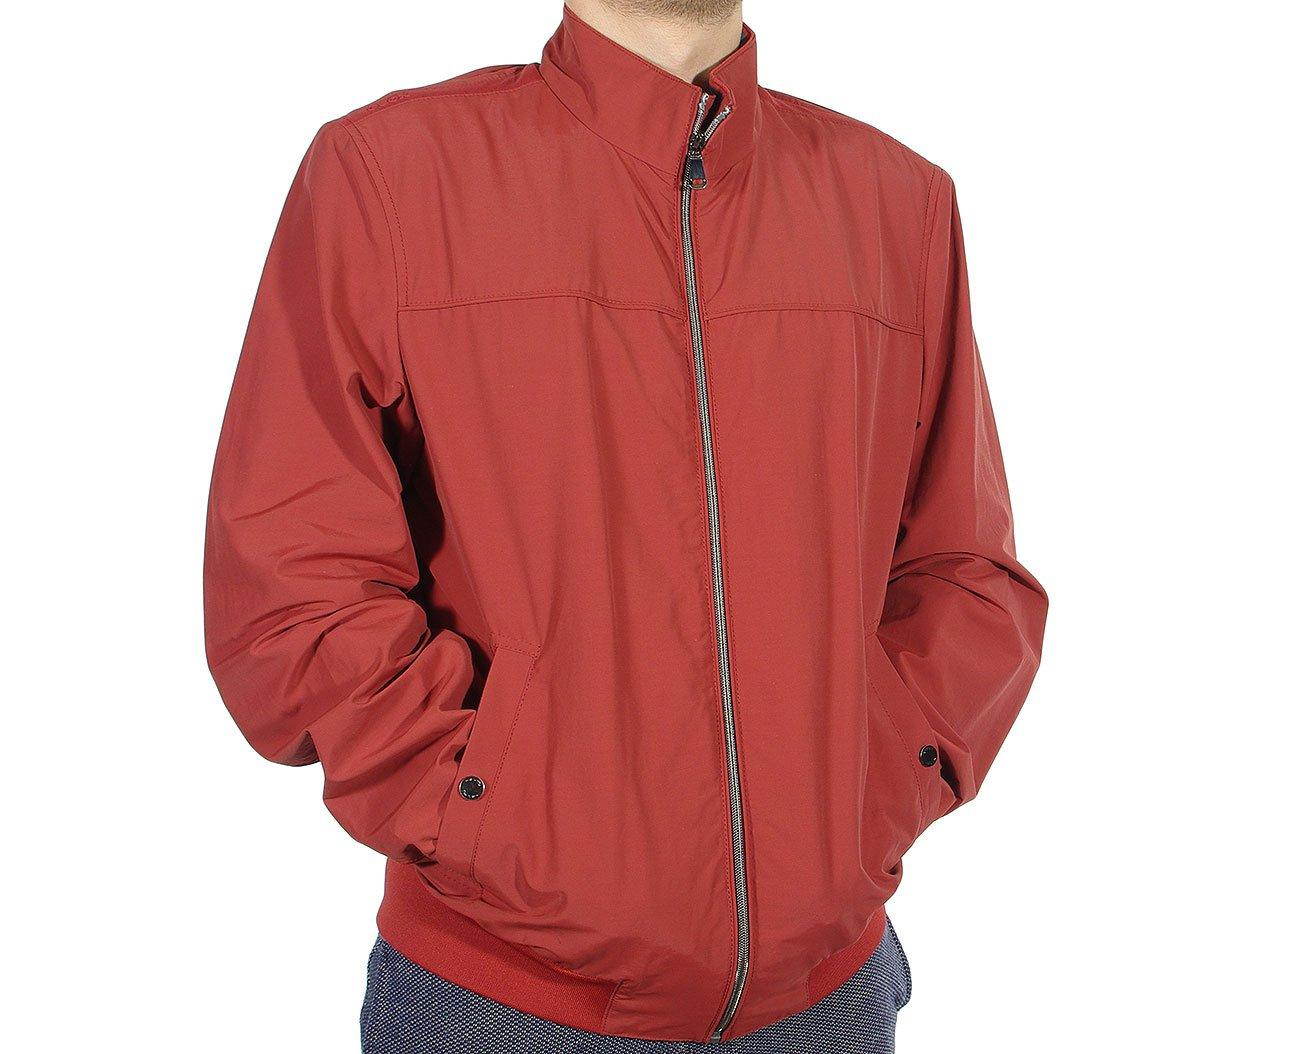 GEOX M8220D kurtka man jacket rosewood red